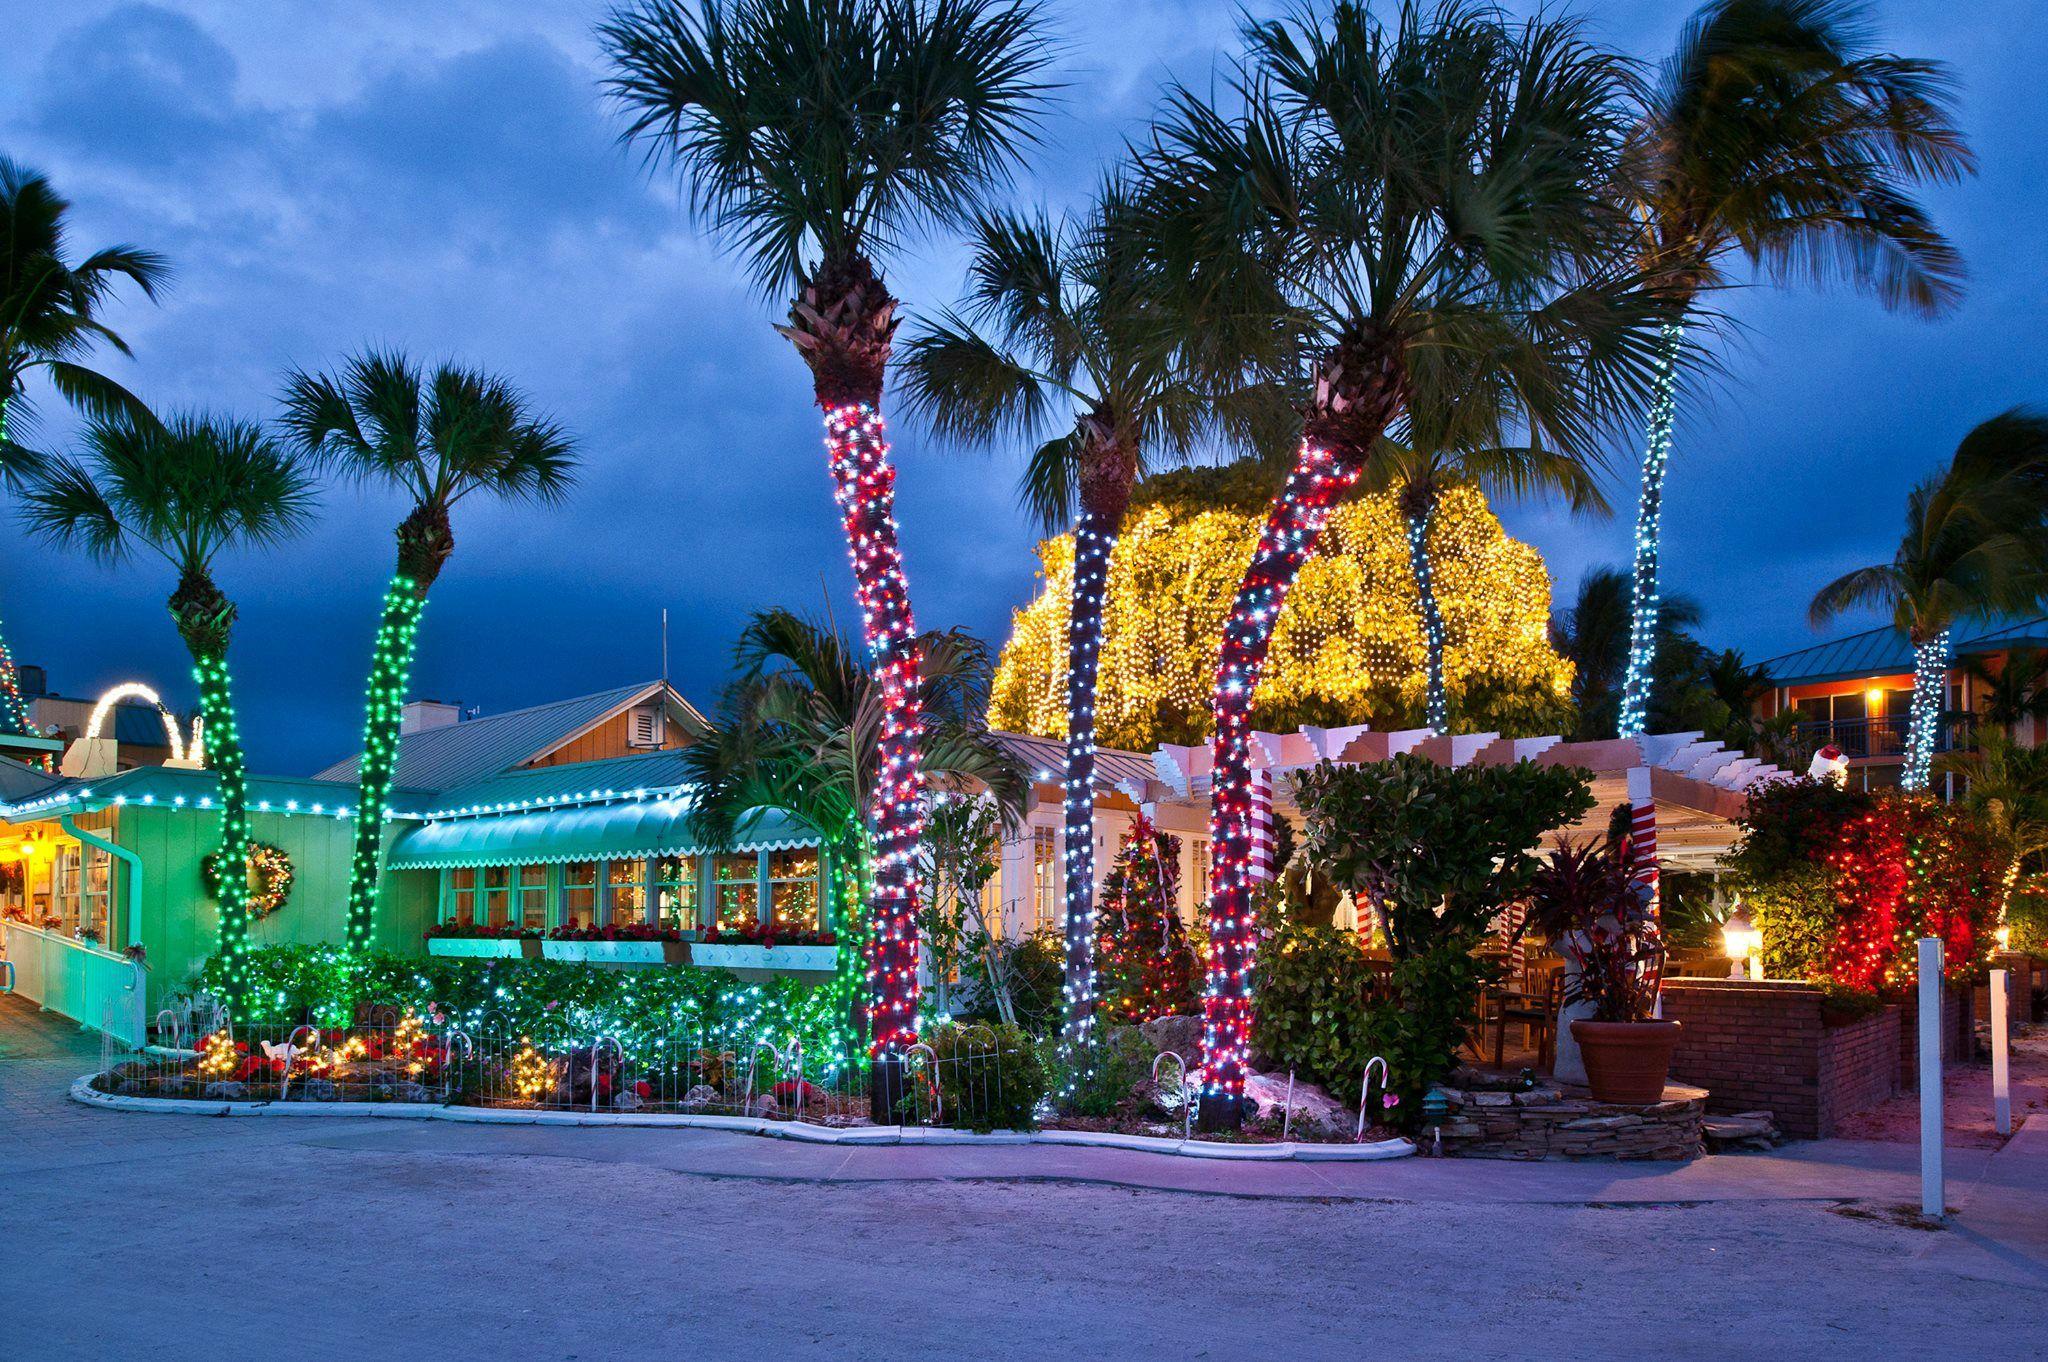 Dazzling decorations at tween waters inn beach resort on